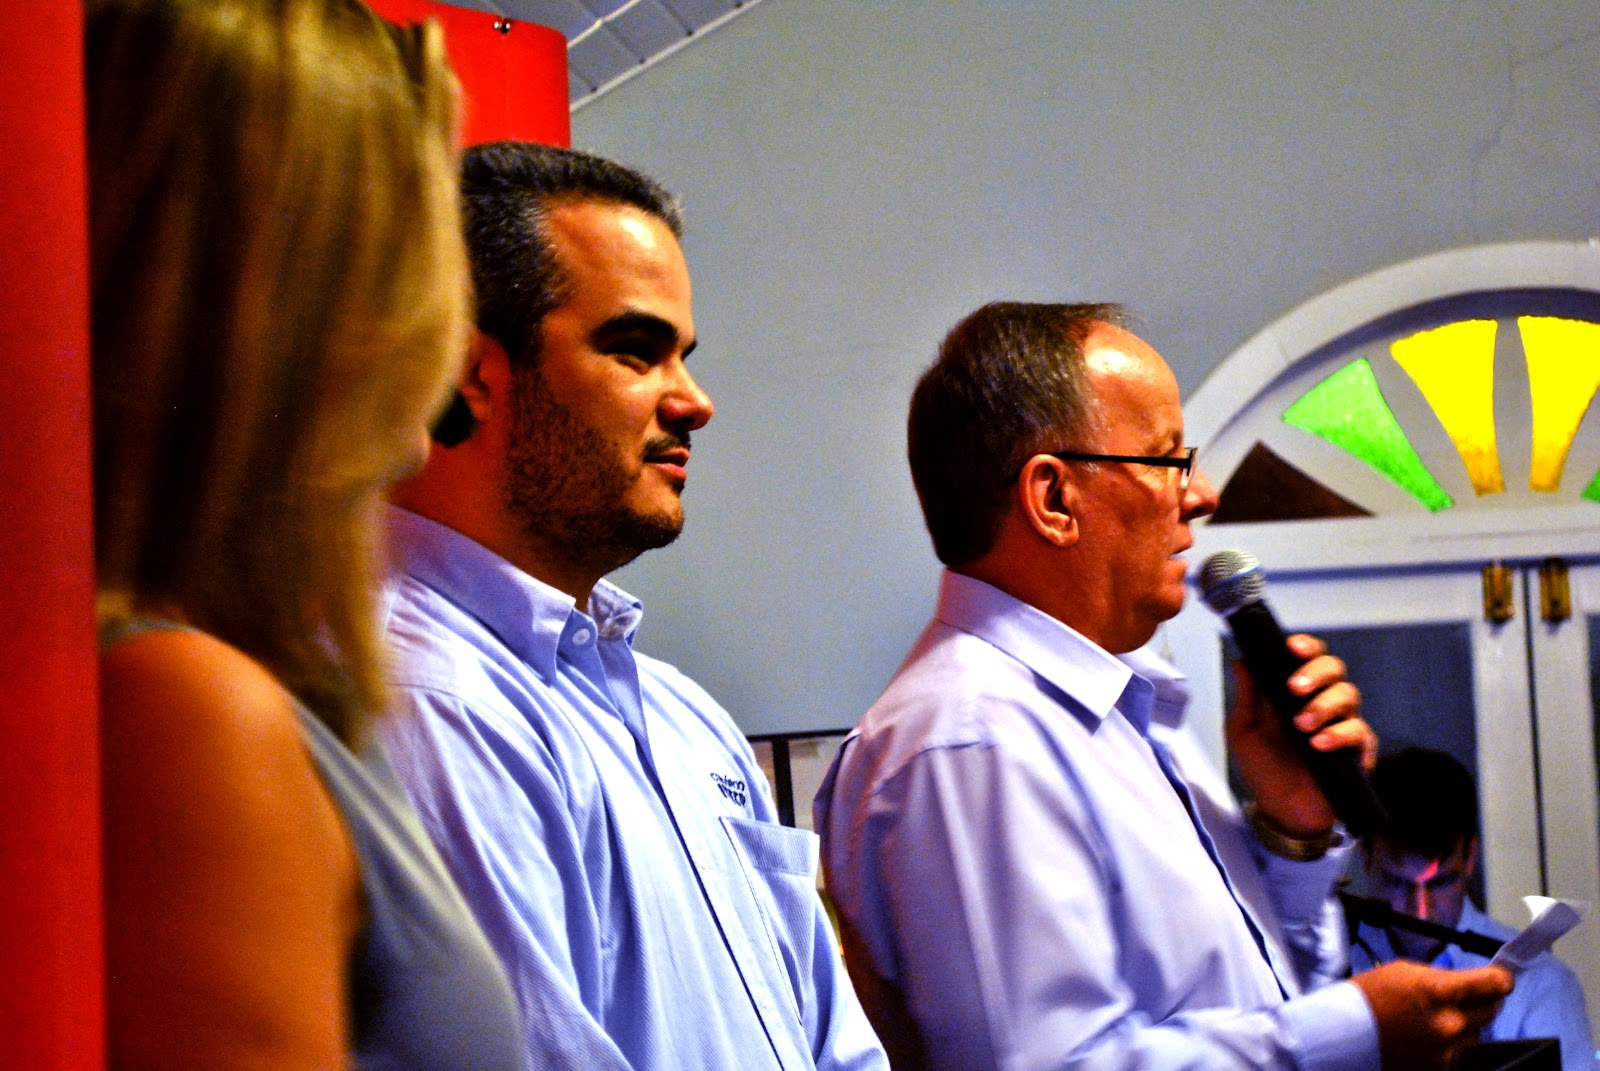 Carboni Iveco de Concórdia realiza Assembléia Nacional do Consórcio Iveco XDSC 0079